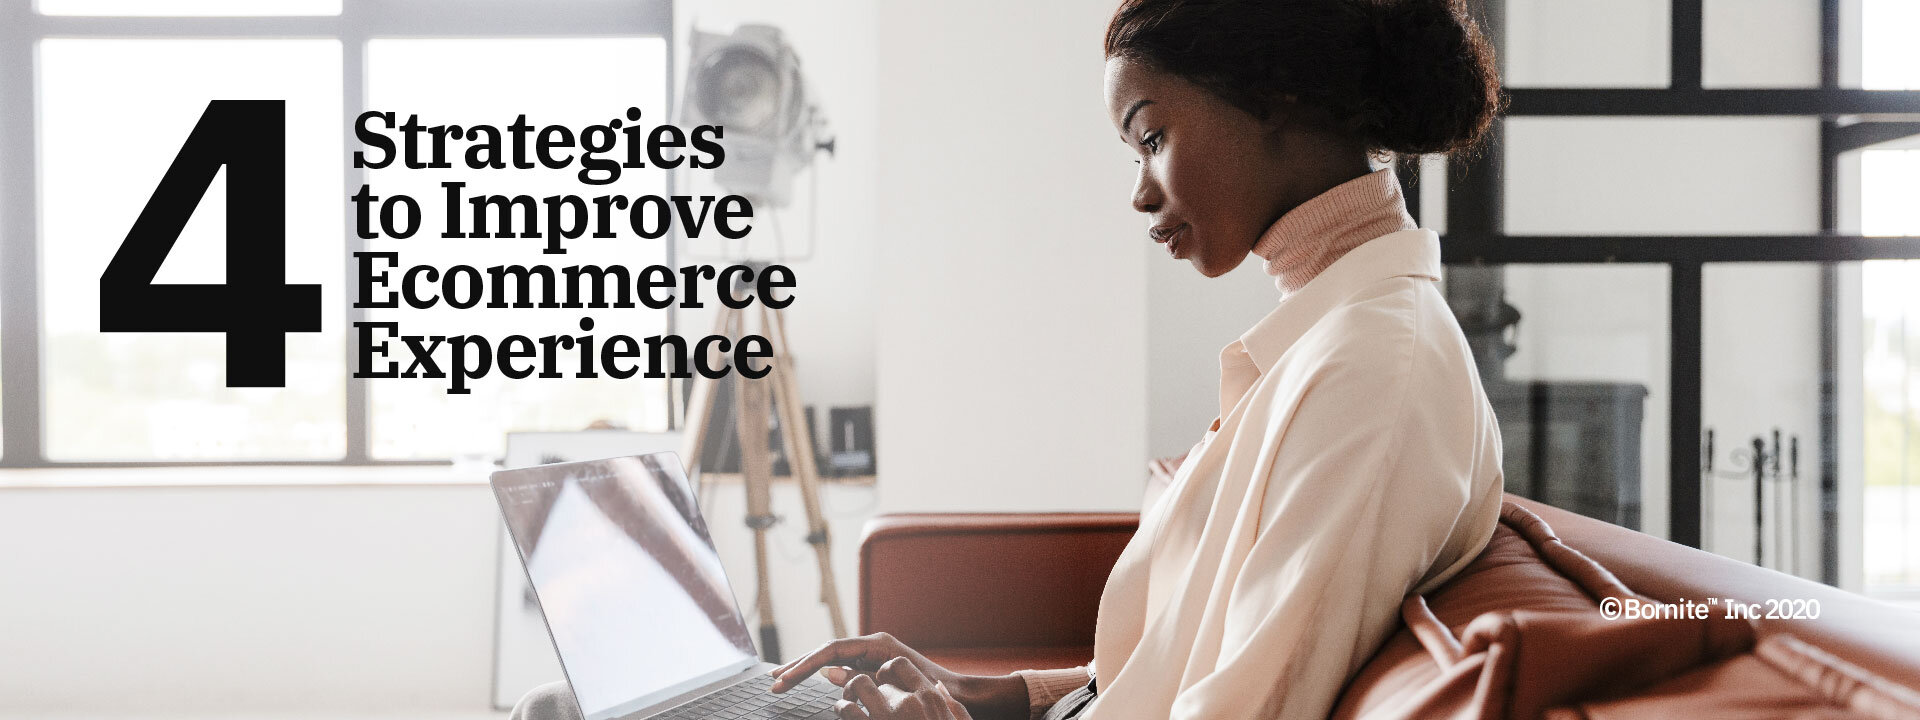 4 Strategies to Improve Ecommerce Experience - Bornite Inc